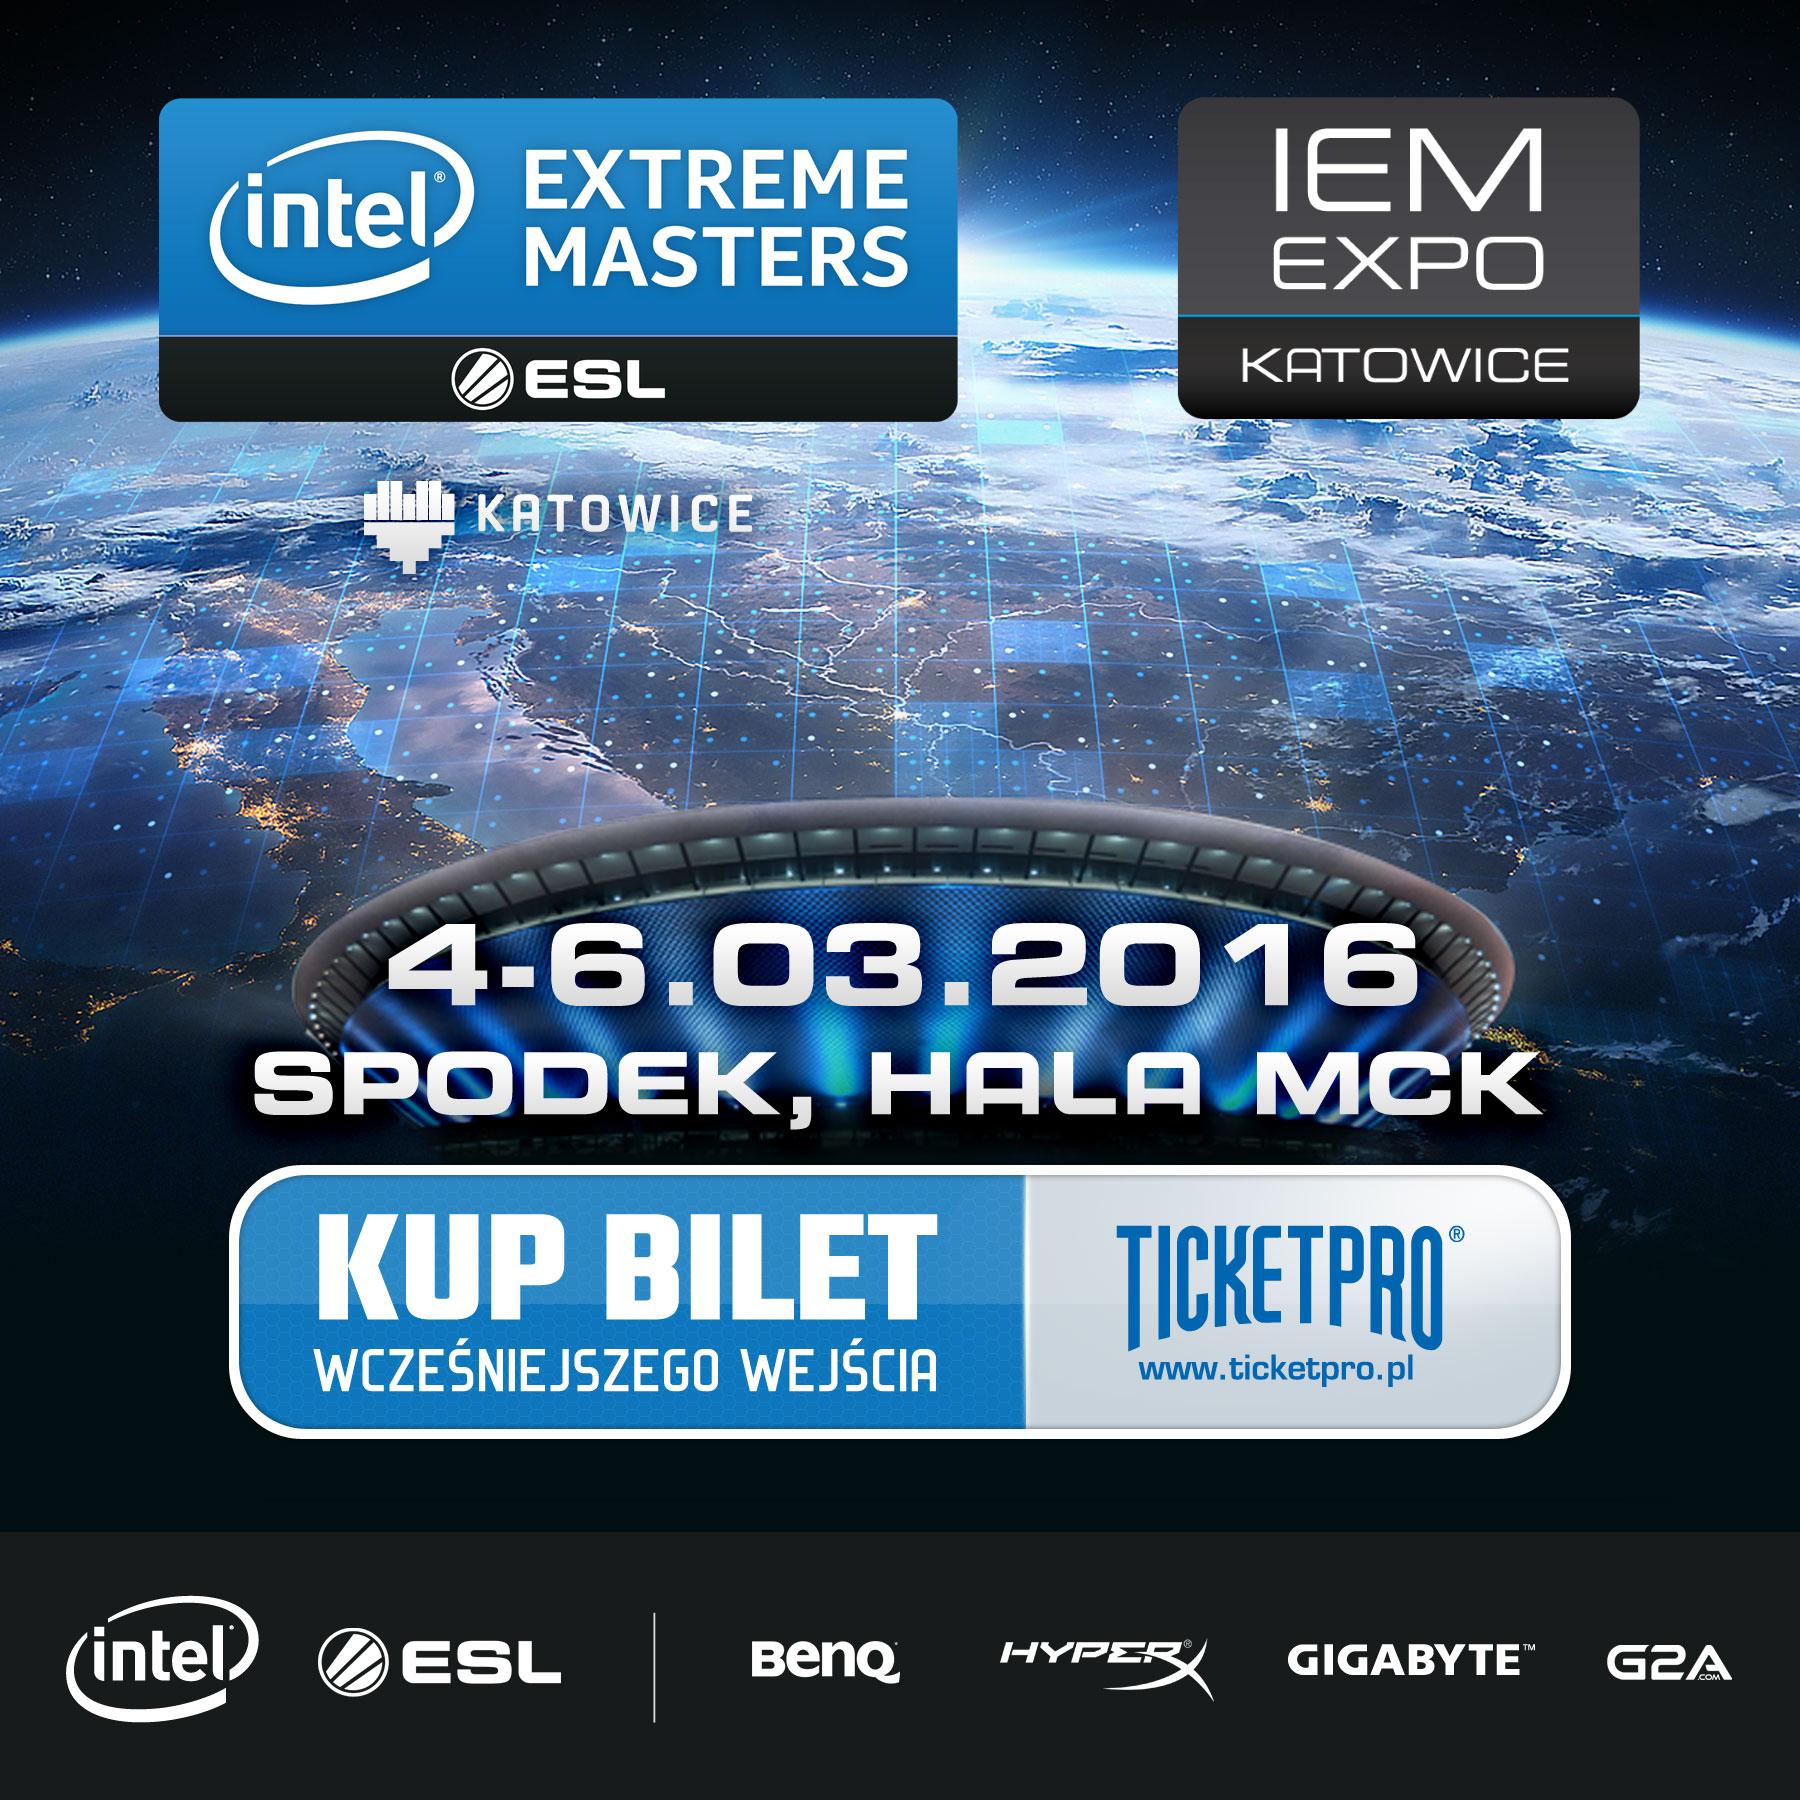 Intel-Extreme-Masters-Katowice-2016-News-Styczeń-001